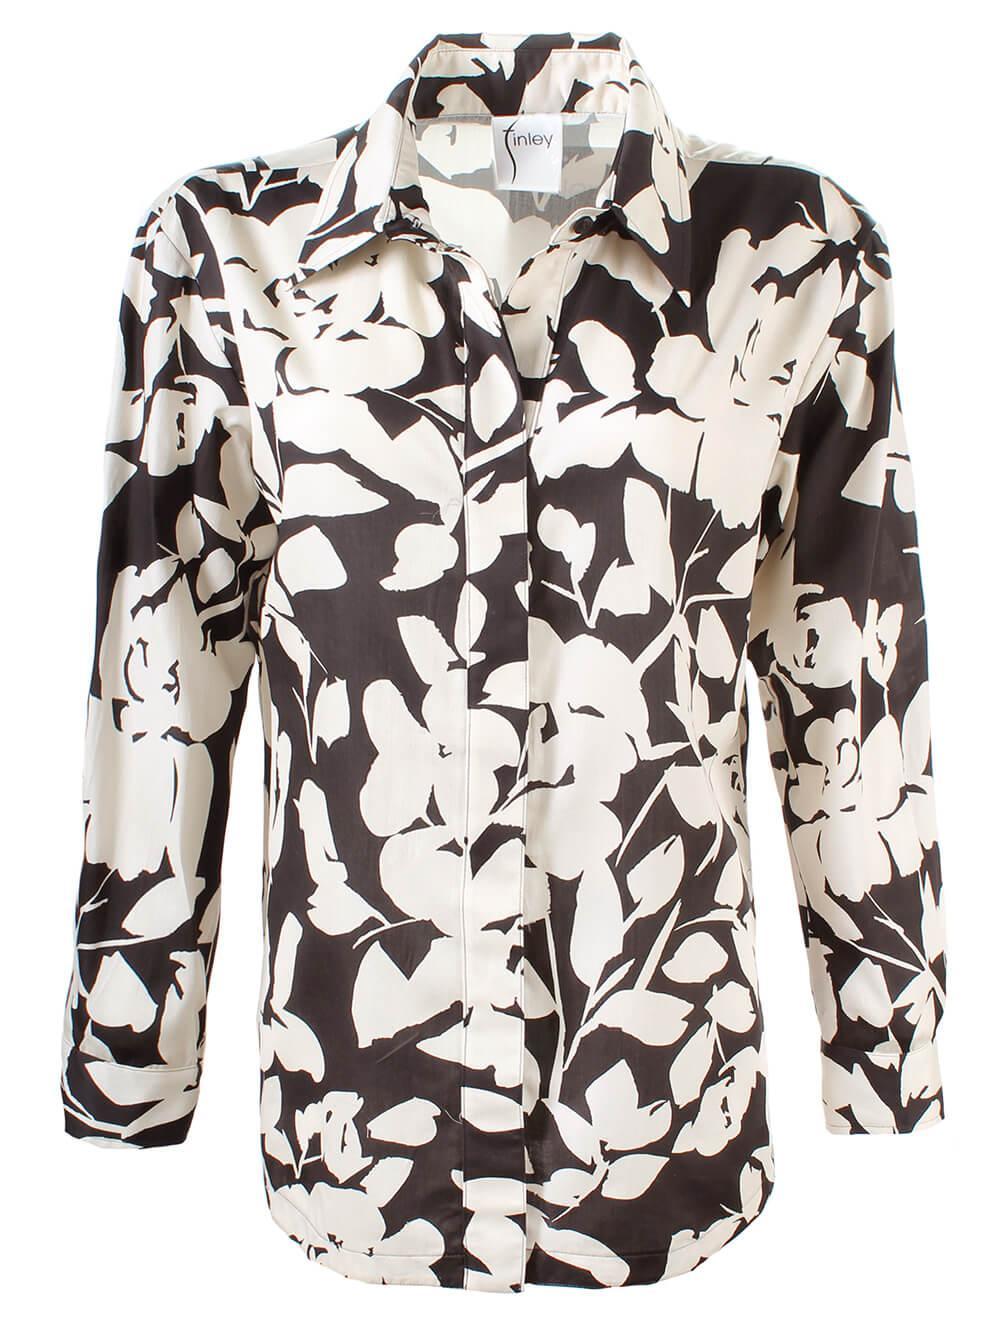 Boyfriend Shirt Item # 3530071S